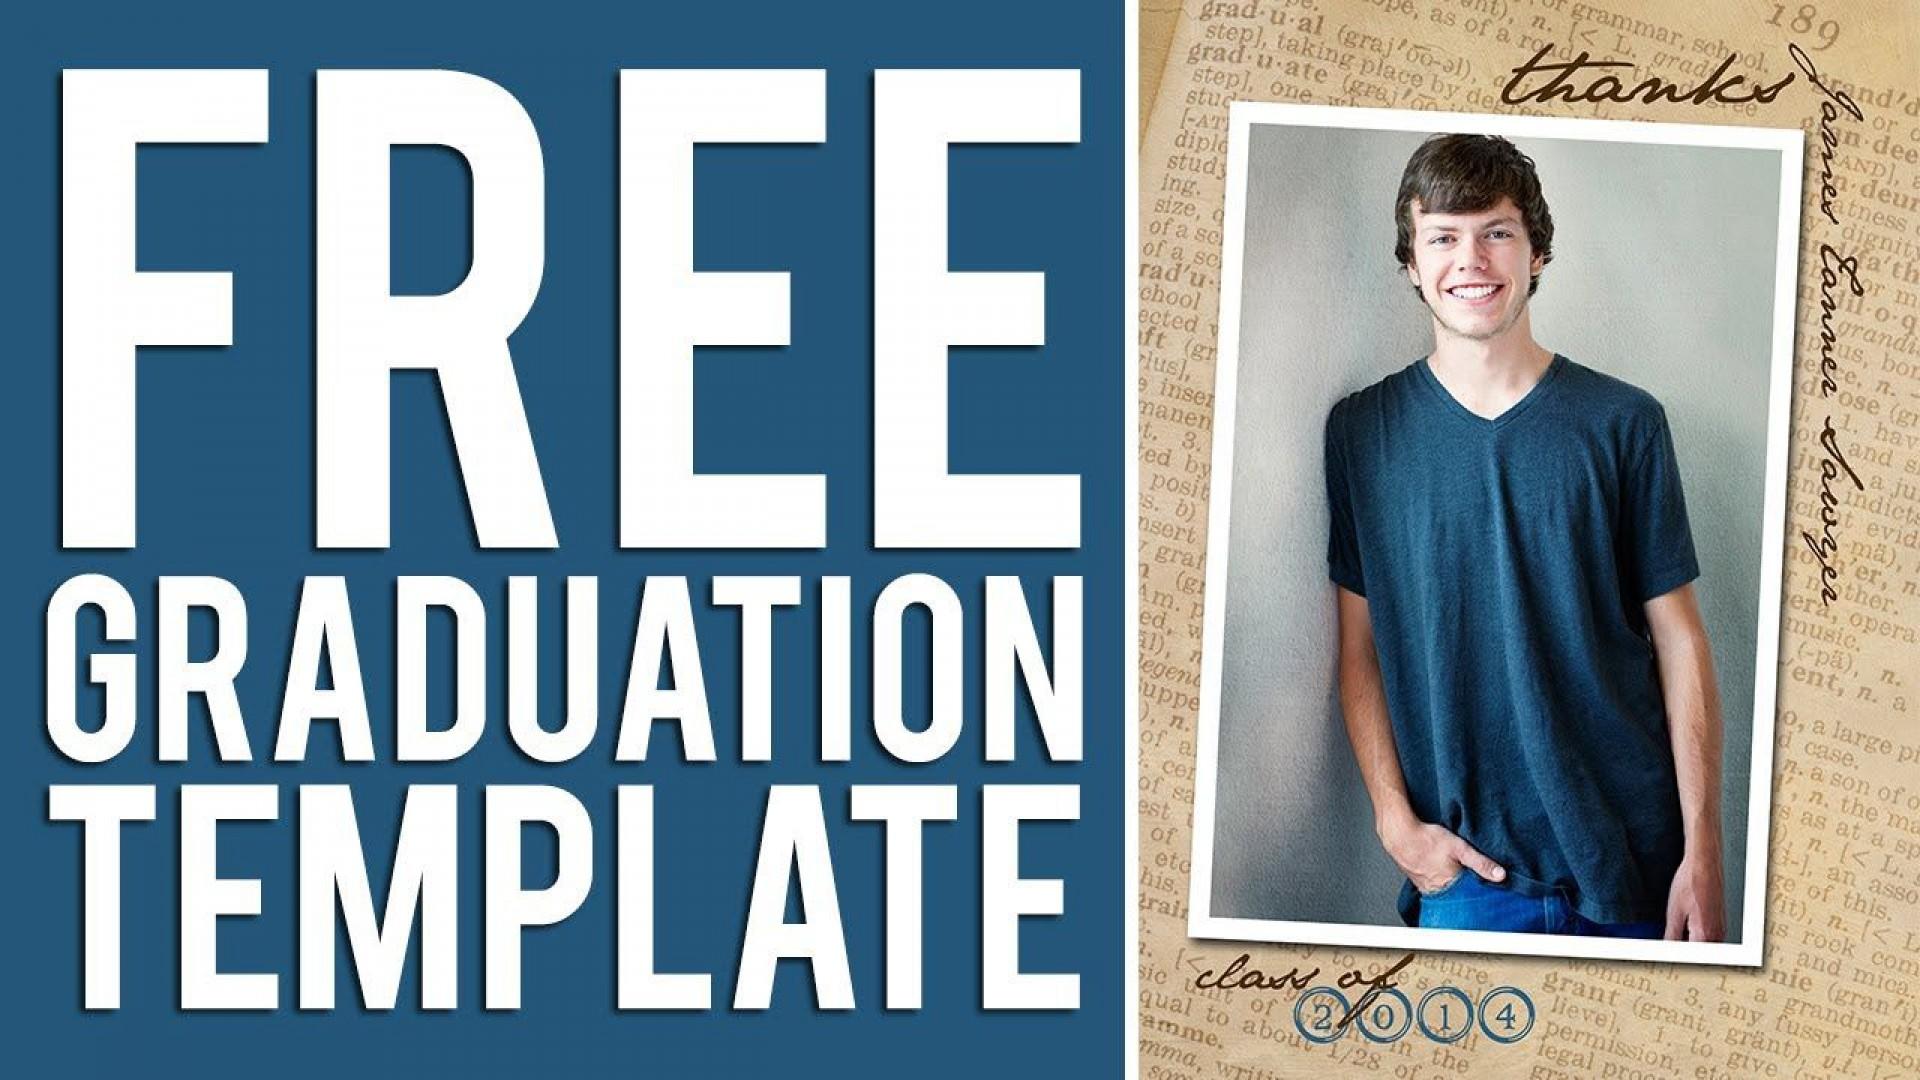 008 Wondrou Free Senior Template For Photoshop High Definition  Collage1920